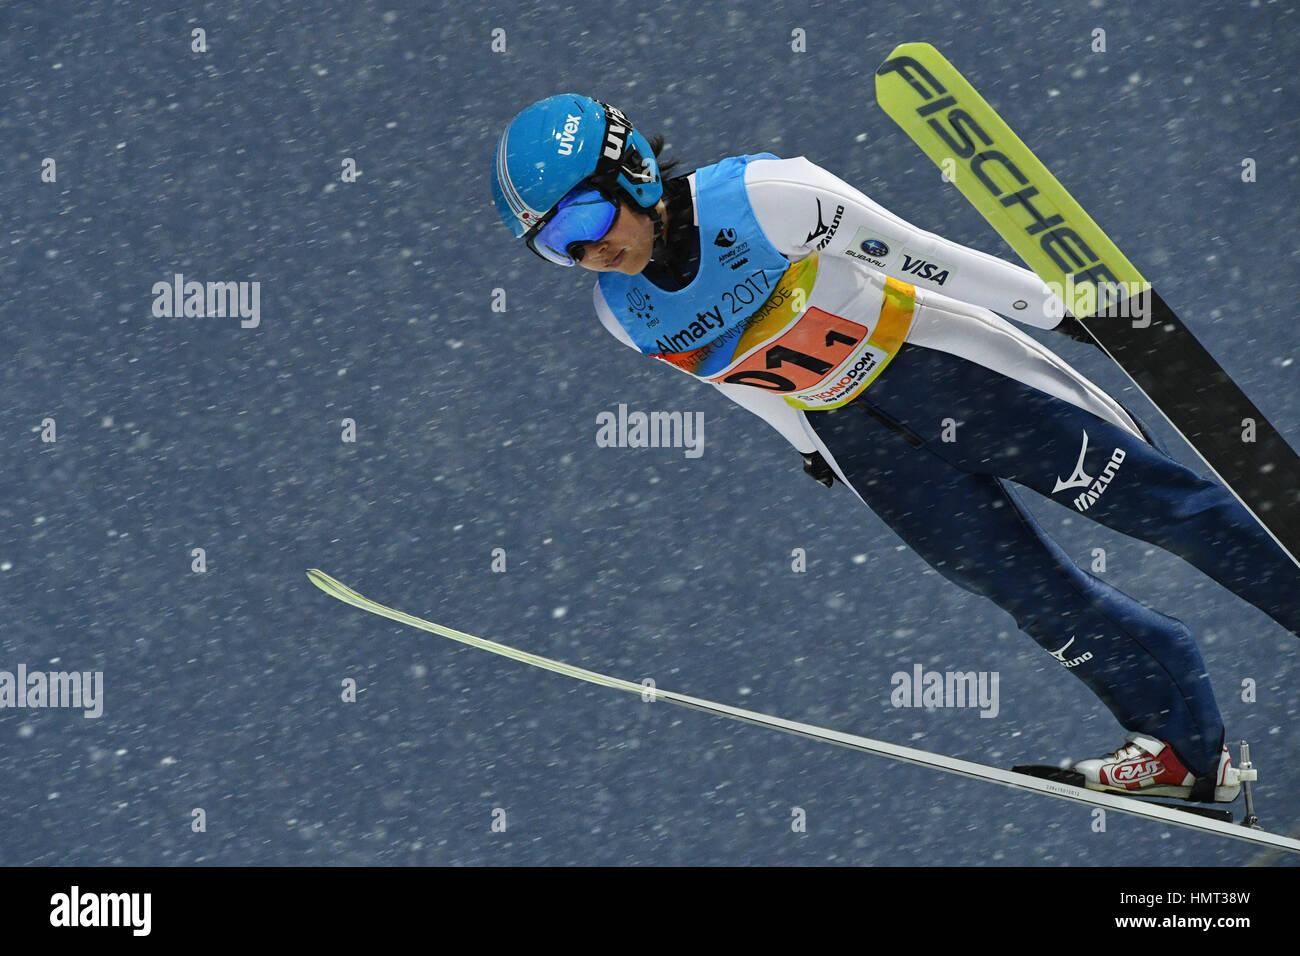 Sunkar International Ski Jumping complessa, Almaty, Kazakhstan. 4 febbraio, 2017. Jun Maruyama (JPN), 4 febbraio Immagini Stock